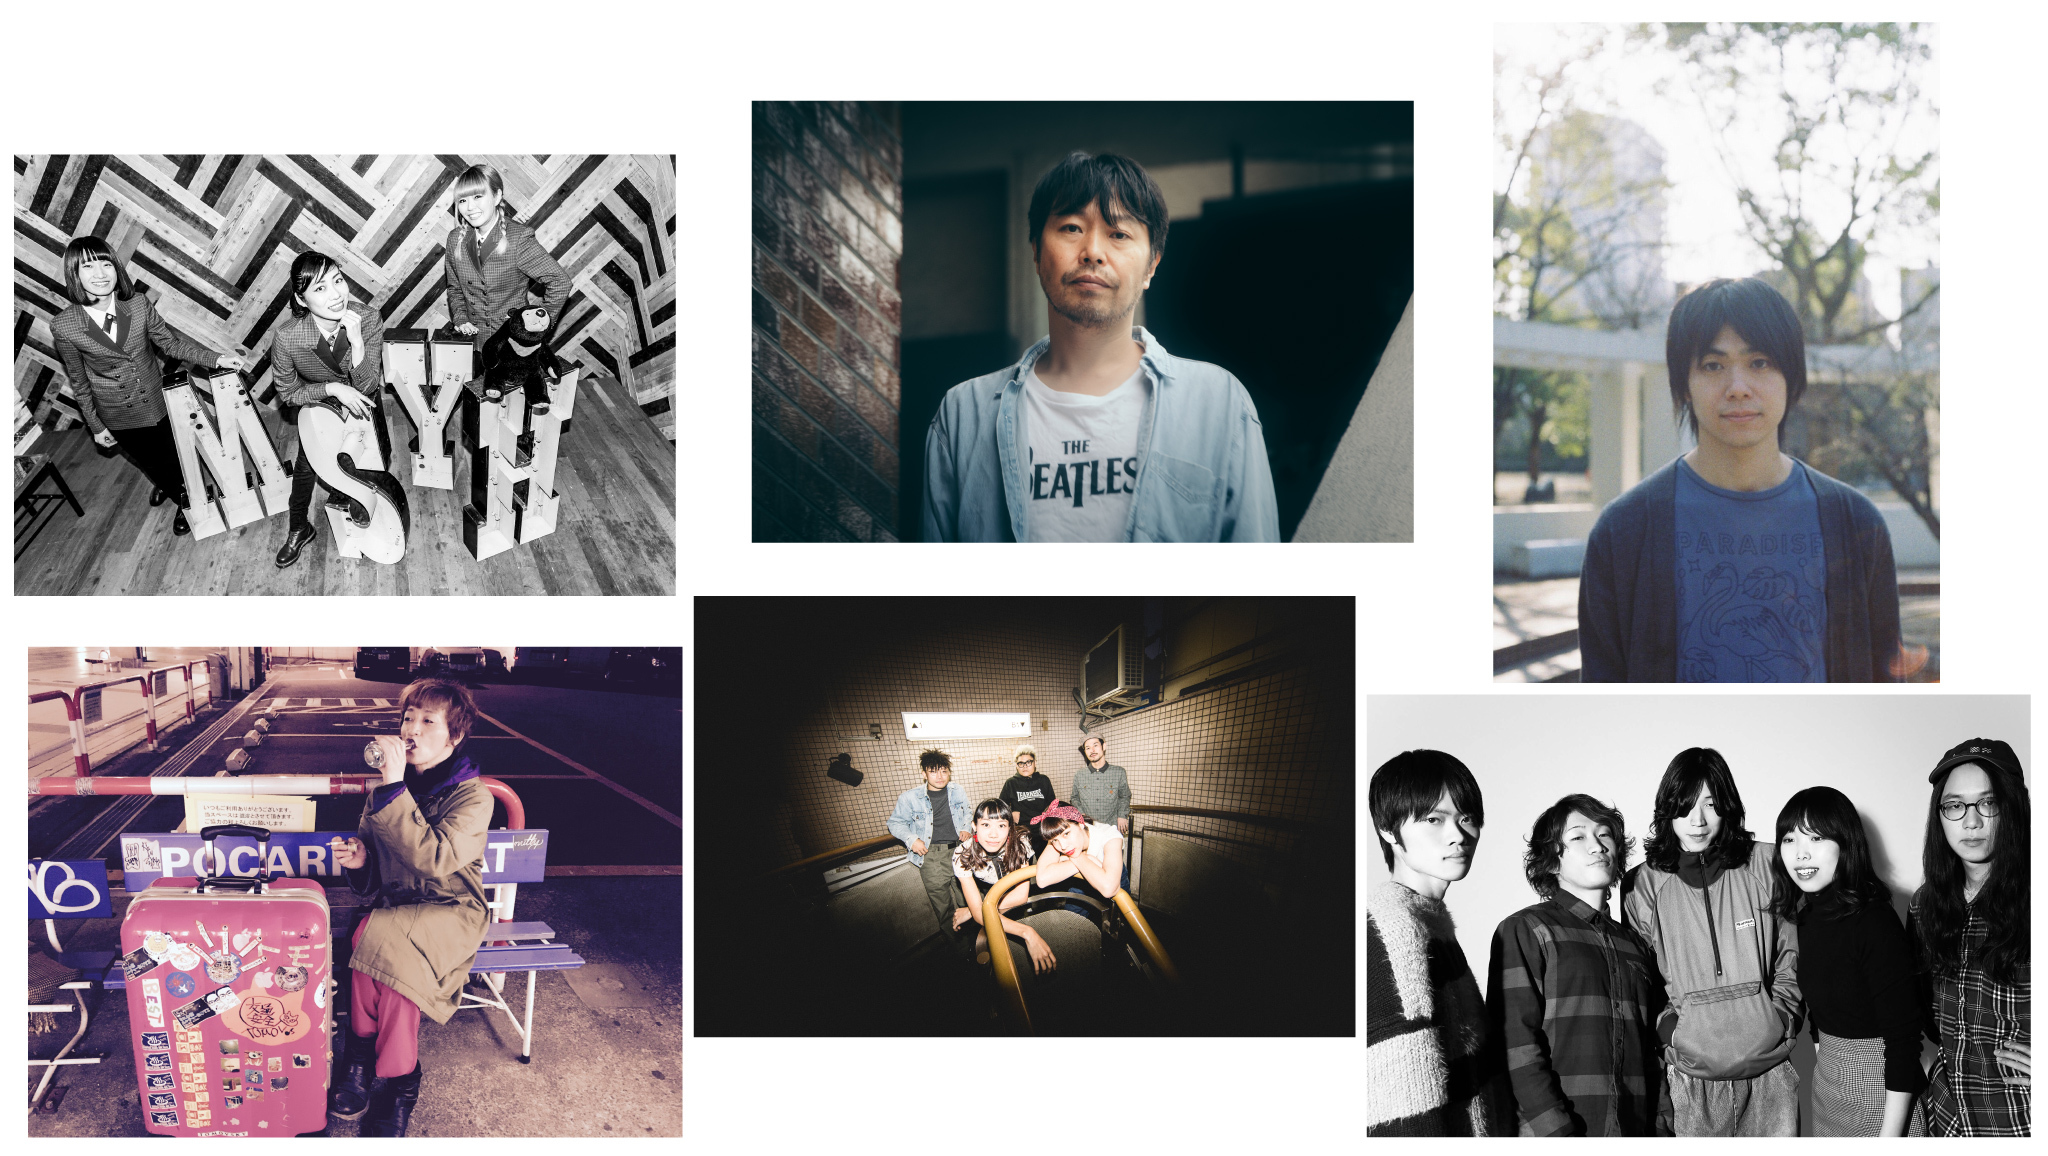 THE STEPHANIES/曽我部恵一/小山田壮平/キイチビール&ザ・ホーリーティッツ/LEARNERS/TOMOVSKY(左上から時計回り)